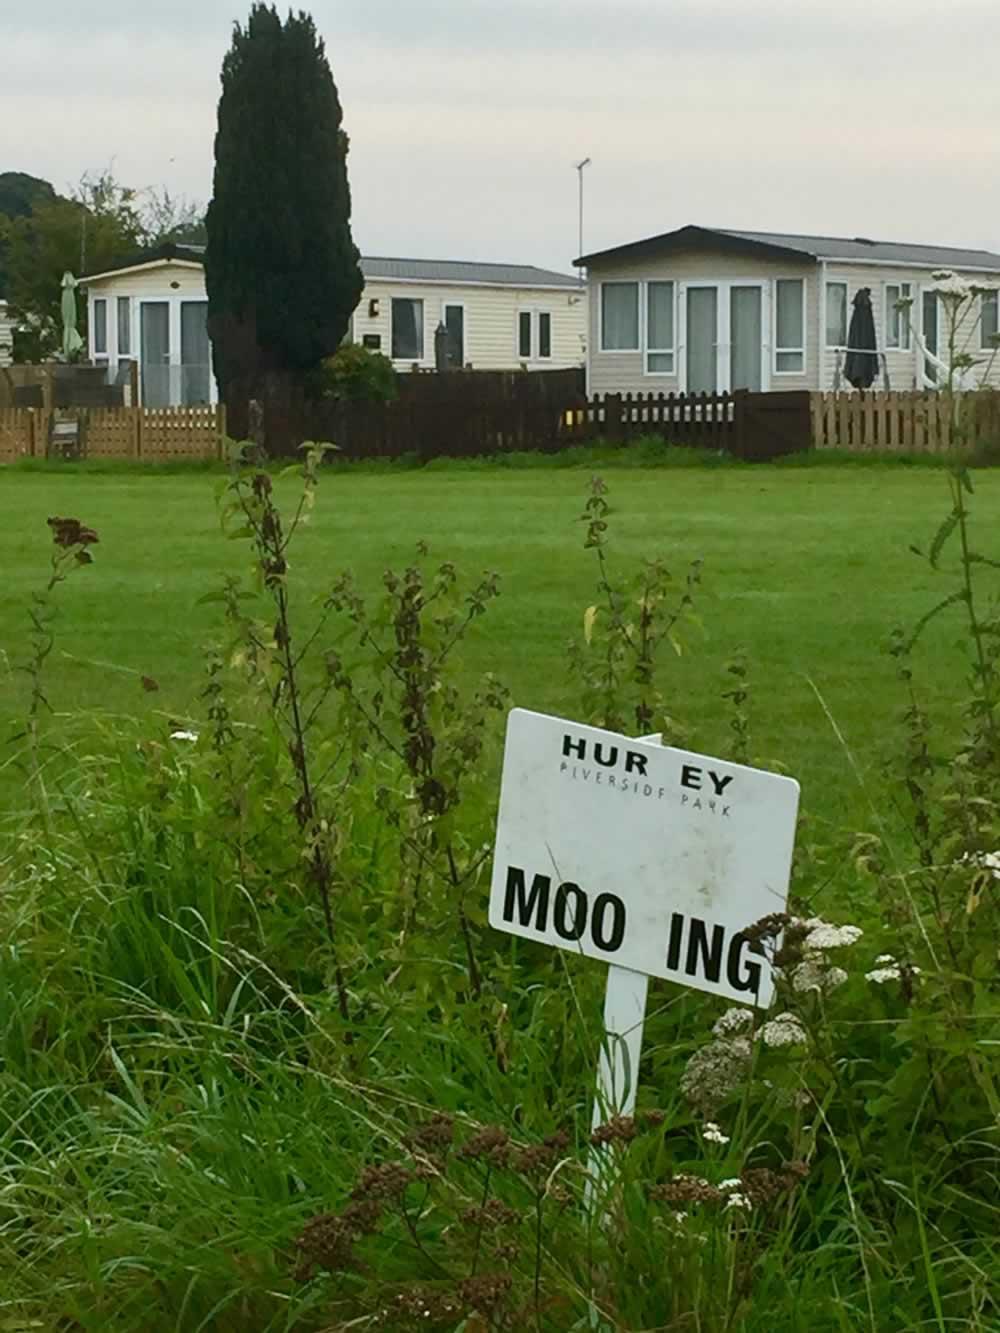 garden with mooring sign